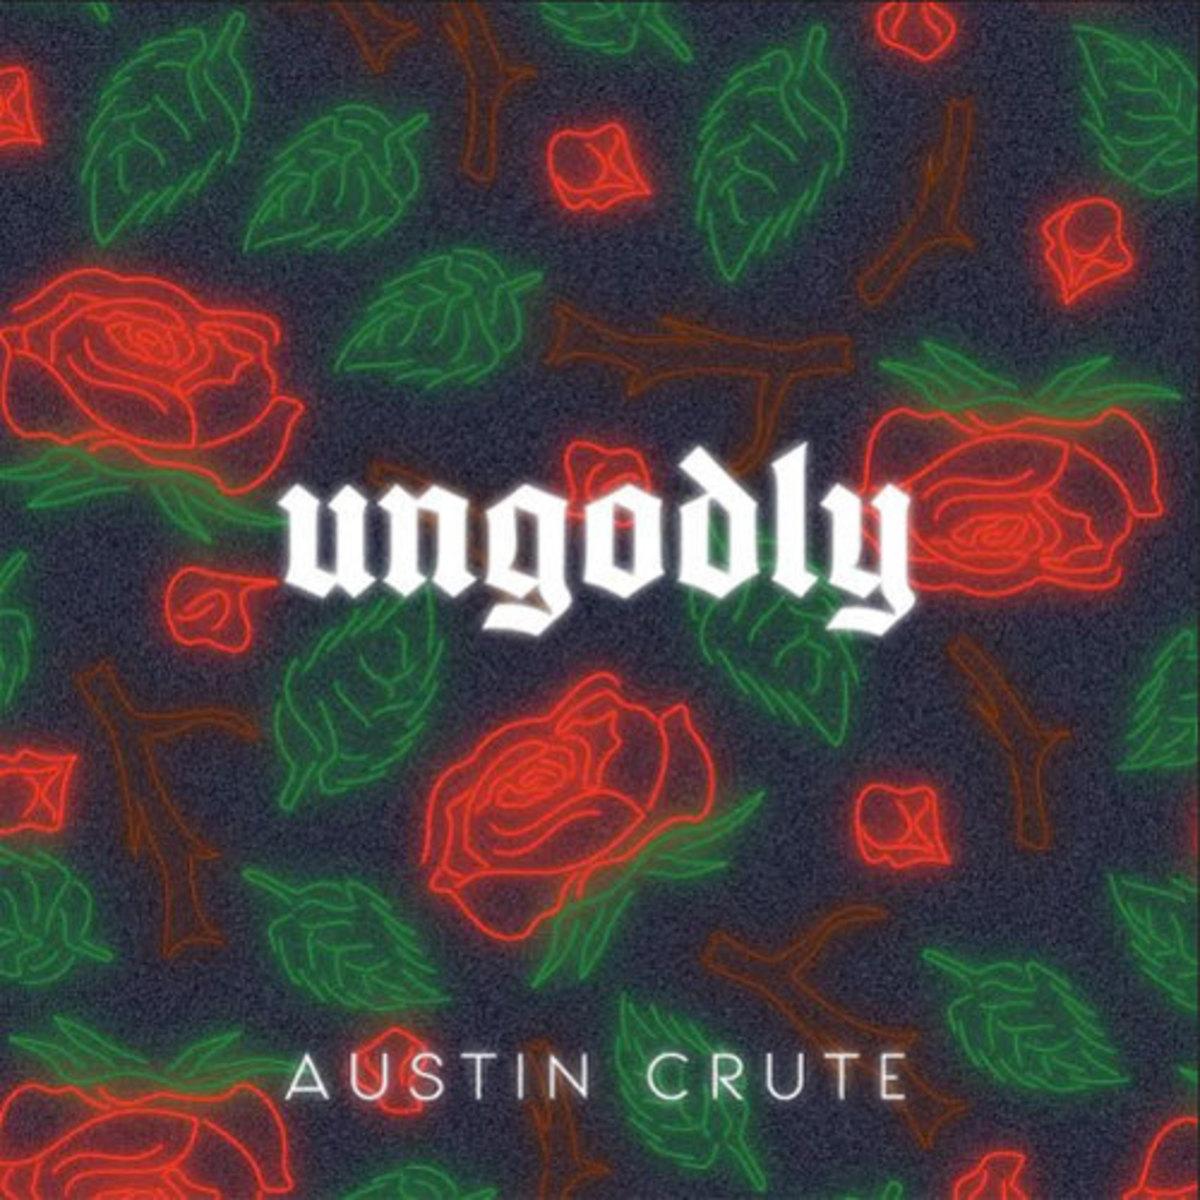 austin-crute-ungodly.jpg